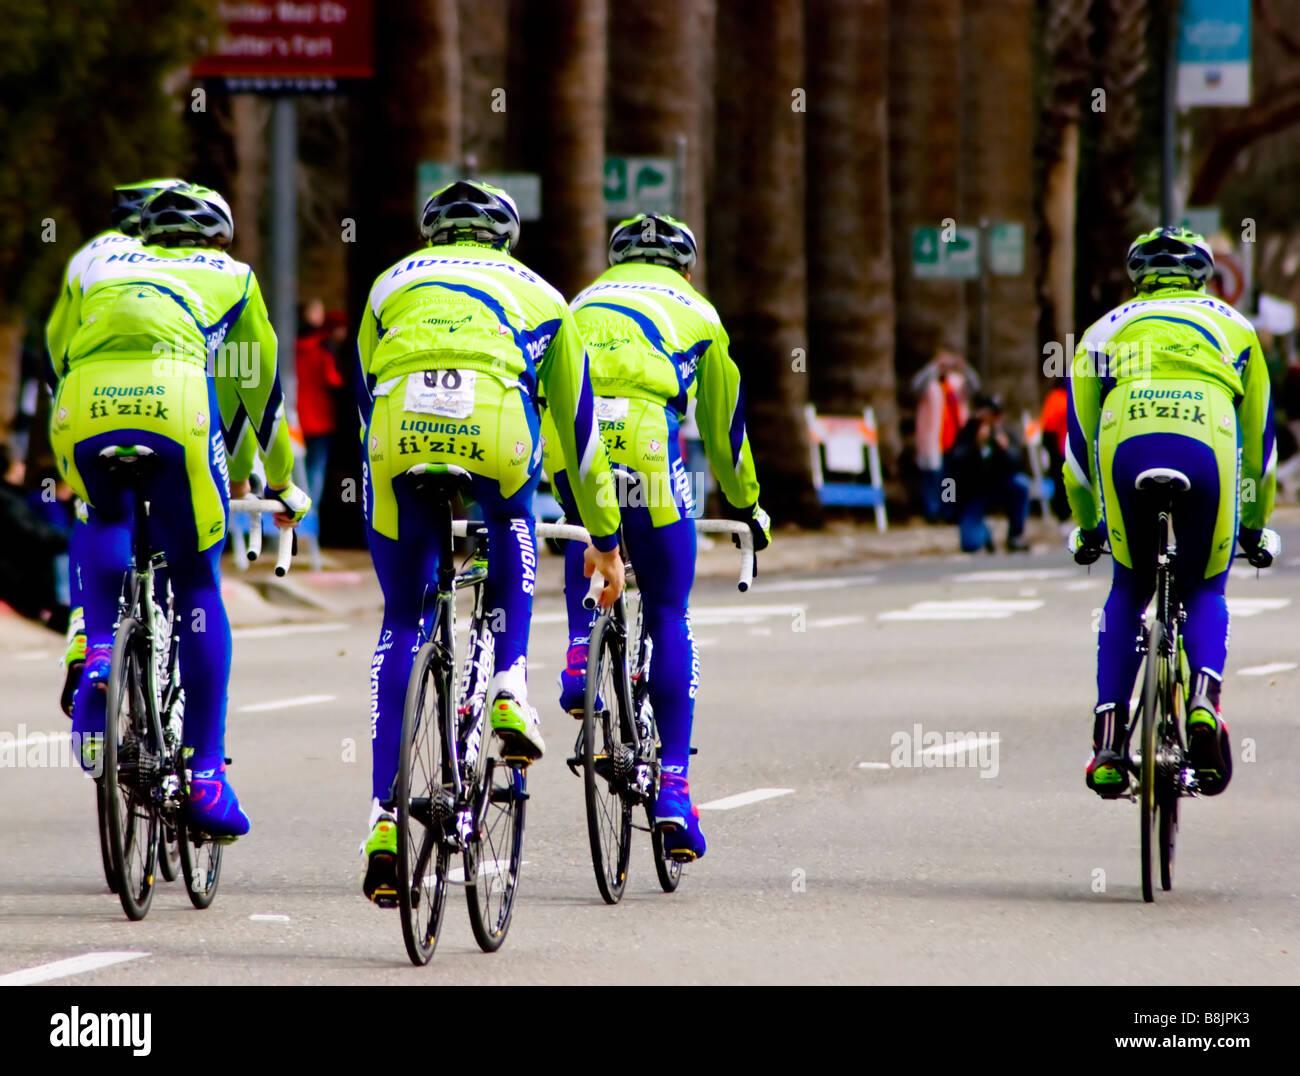 SACRAMENTO CA February 14 2009 Italian Liquidgas pro cycling team preparing for time trials at Amgen Tour of California - Stock Image